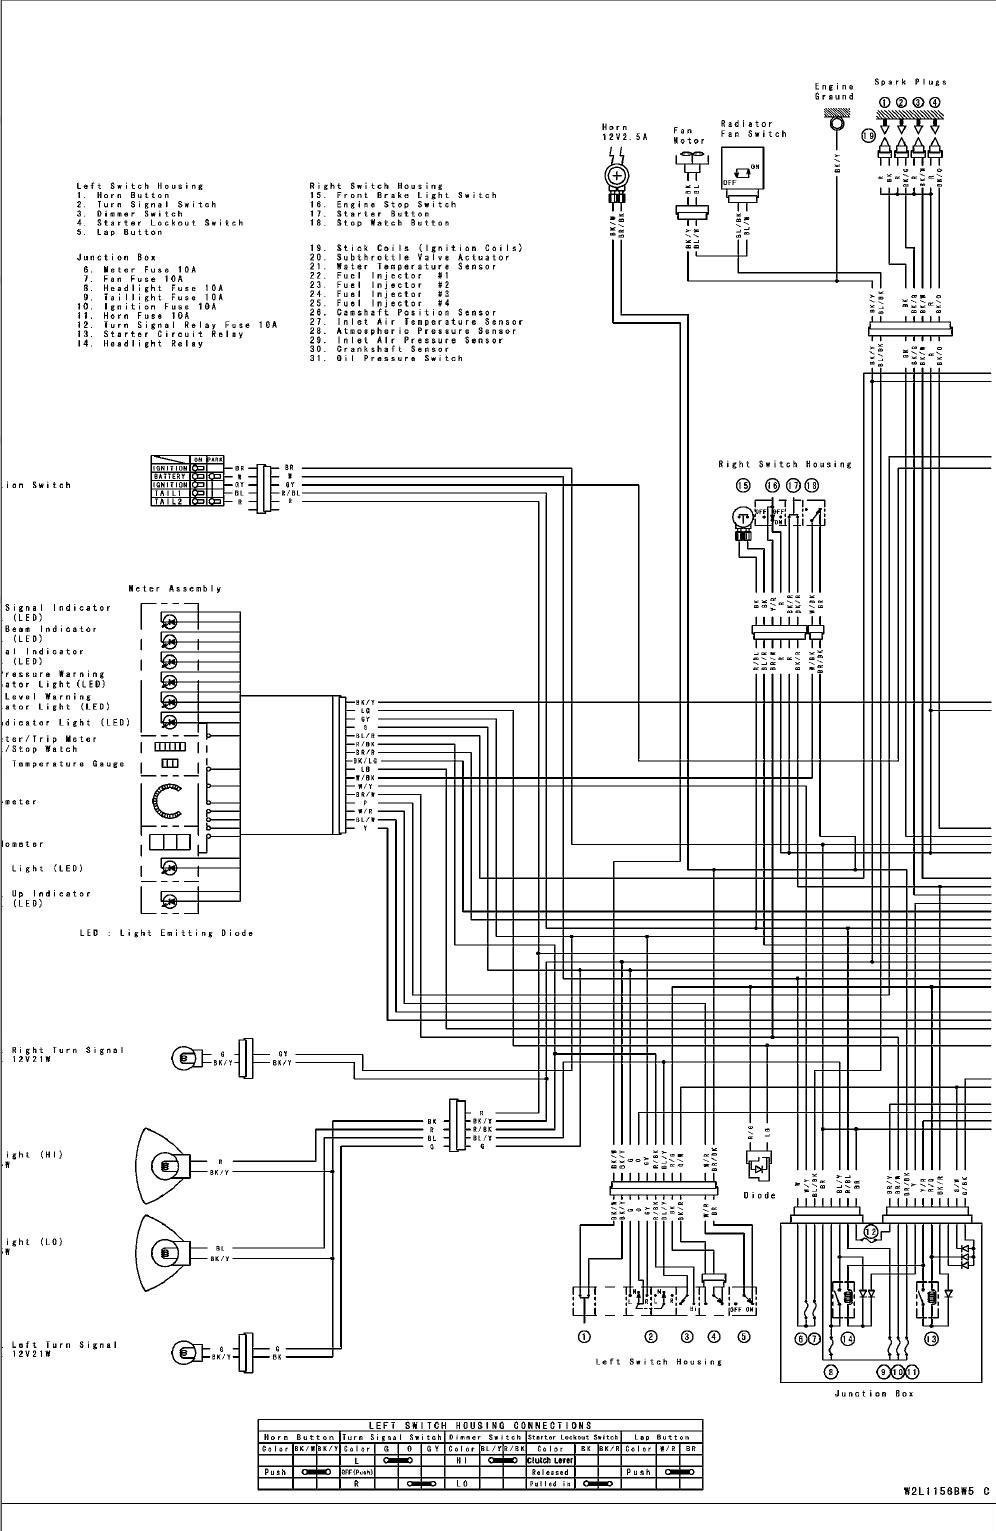 [SCHEMATICS_48IU]  AN_3451] 05 Kawasaki 636 Wiring Diagram | 03 Kawasaki 636 Wiring Diagram |  | Itis Tzici Frag Trons Mohammedshrine Librar Wiring 101